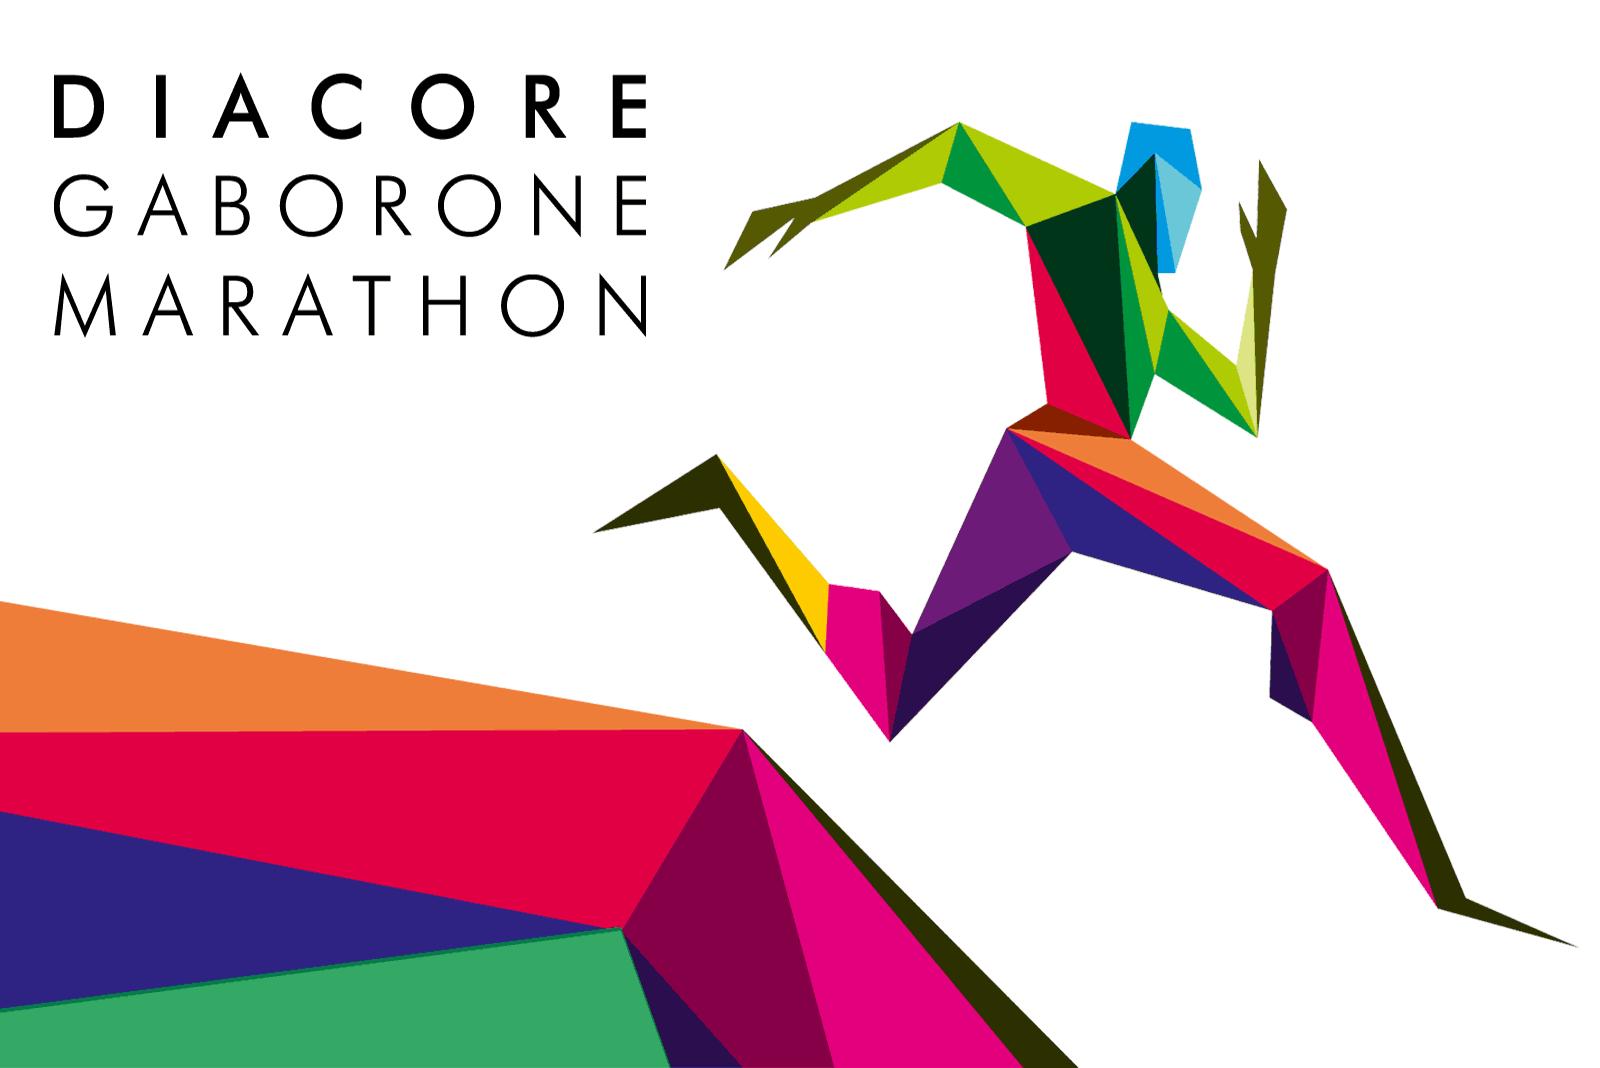 Diacore Marathon